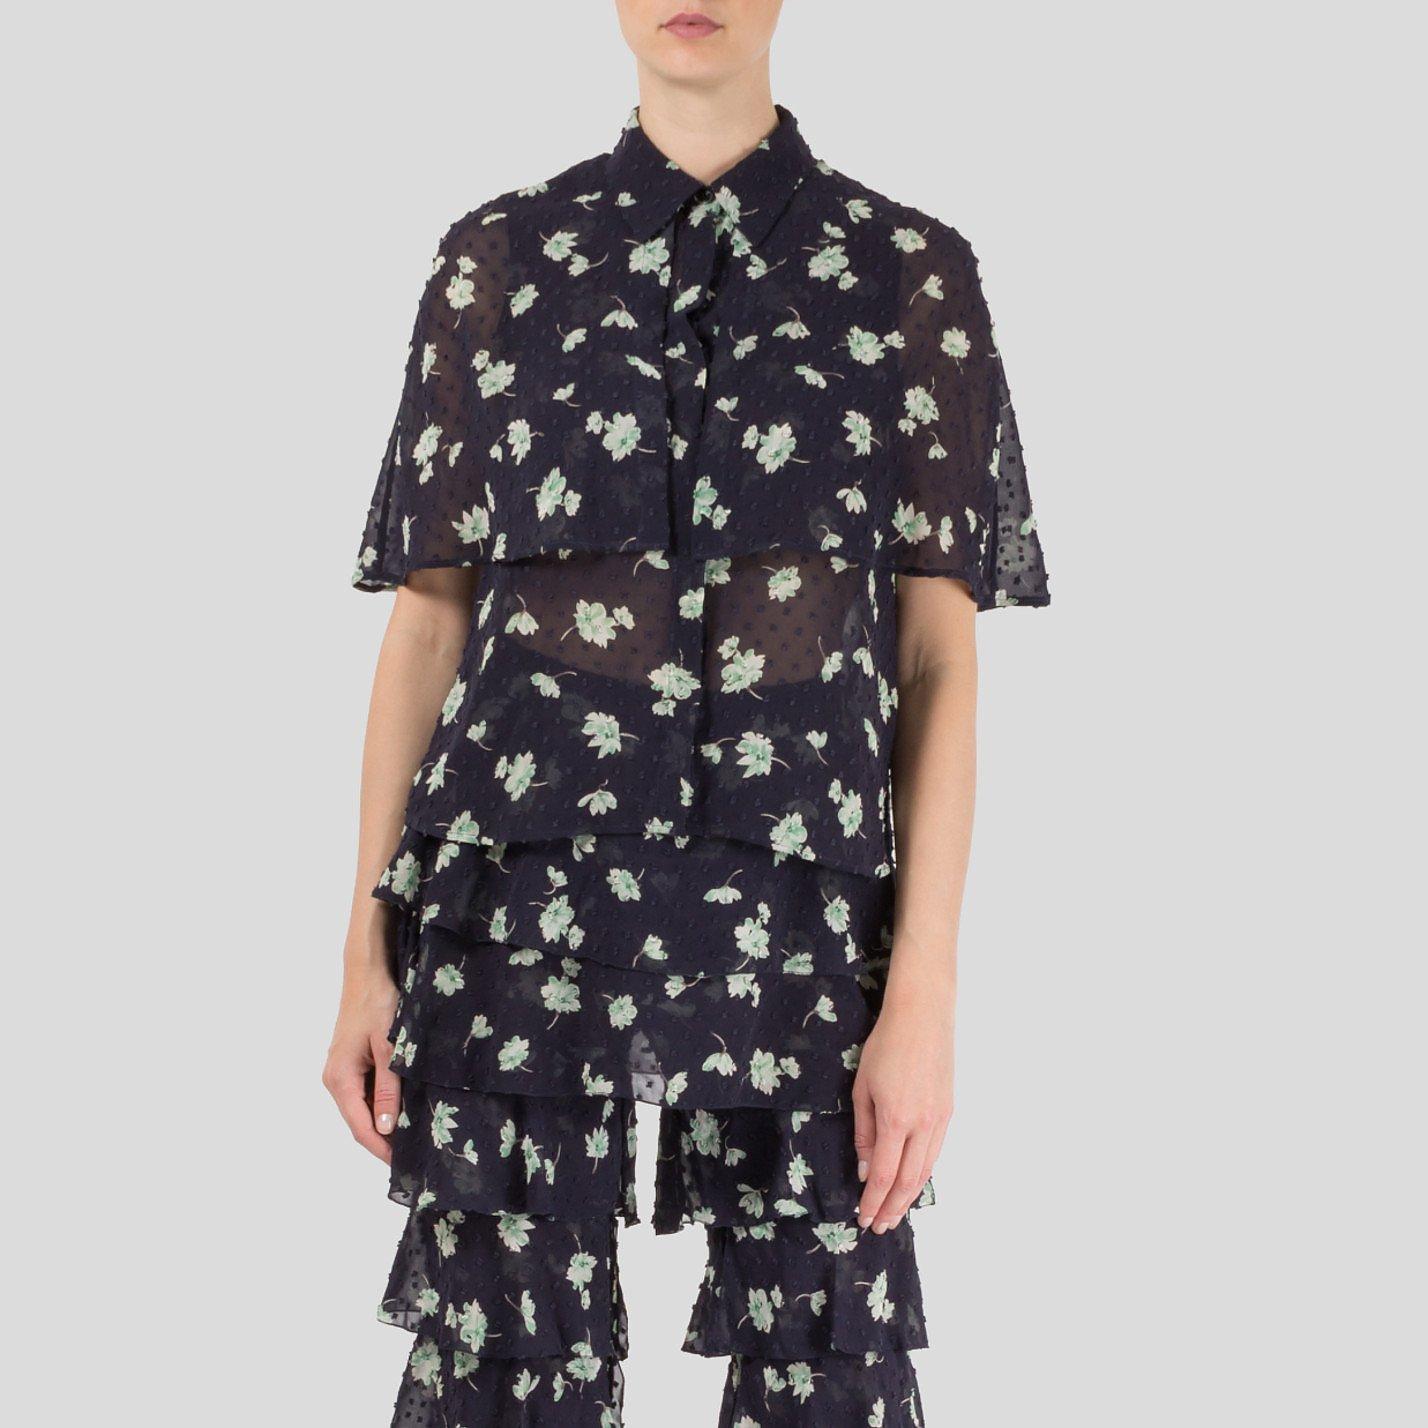 Starsica Floral Print Cape Shirt